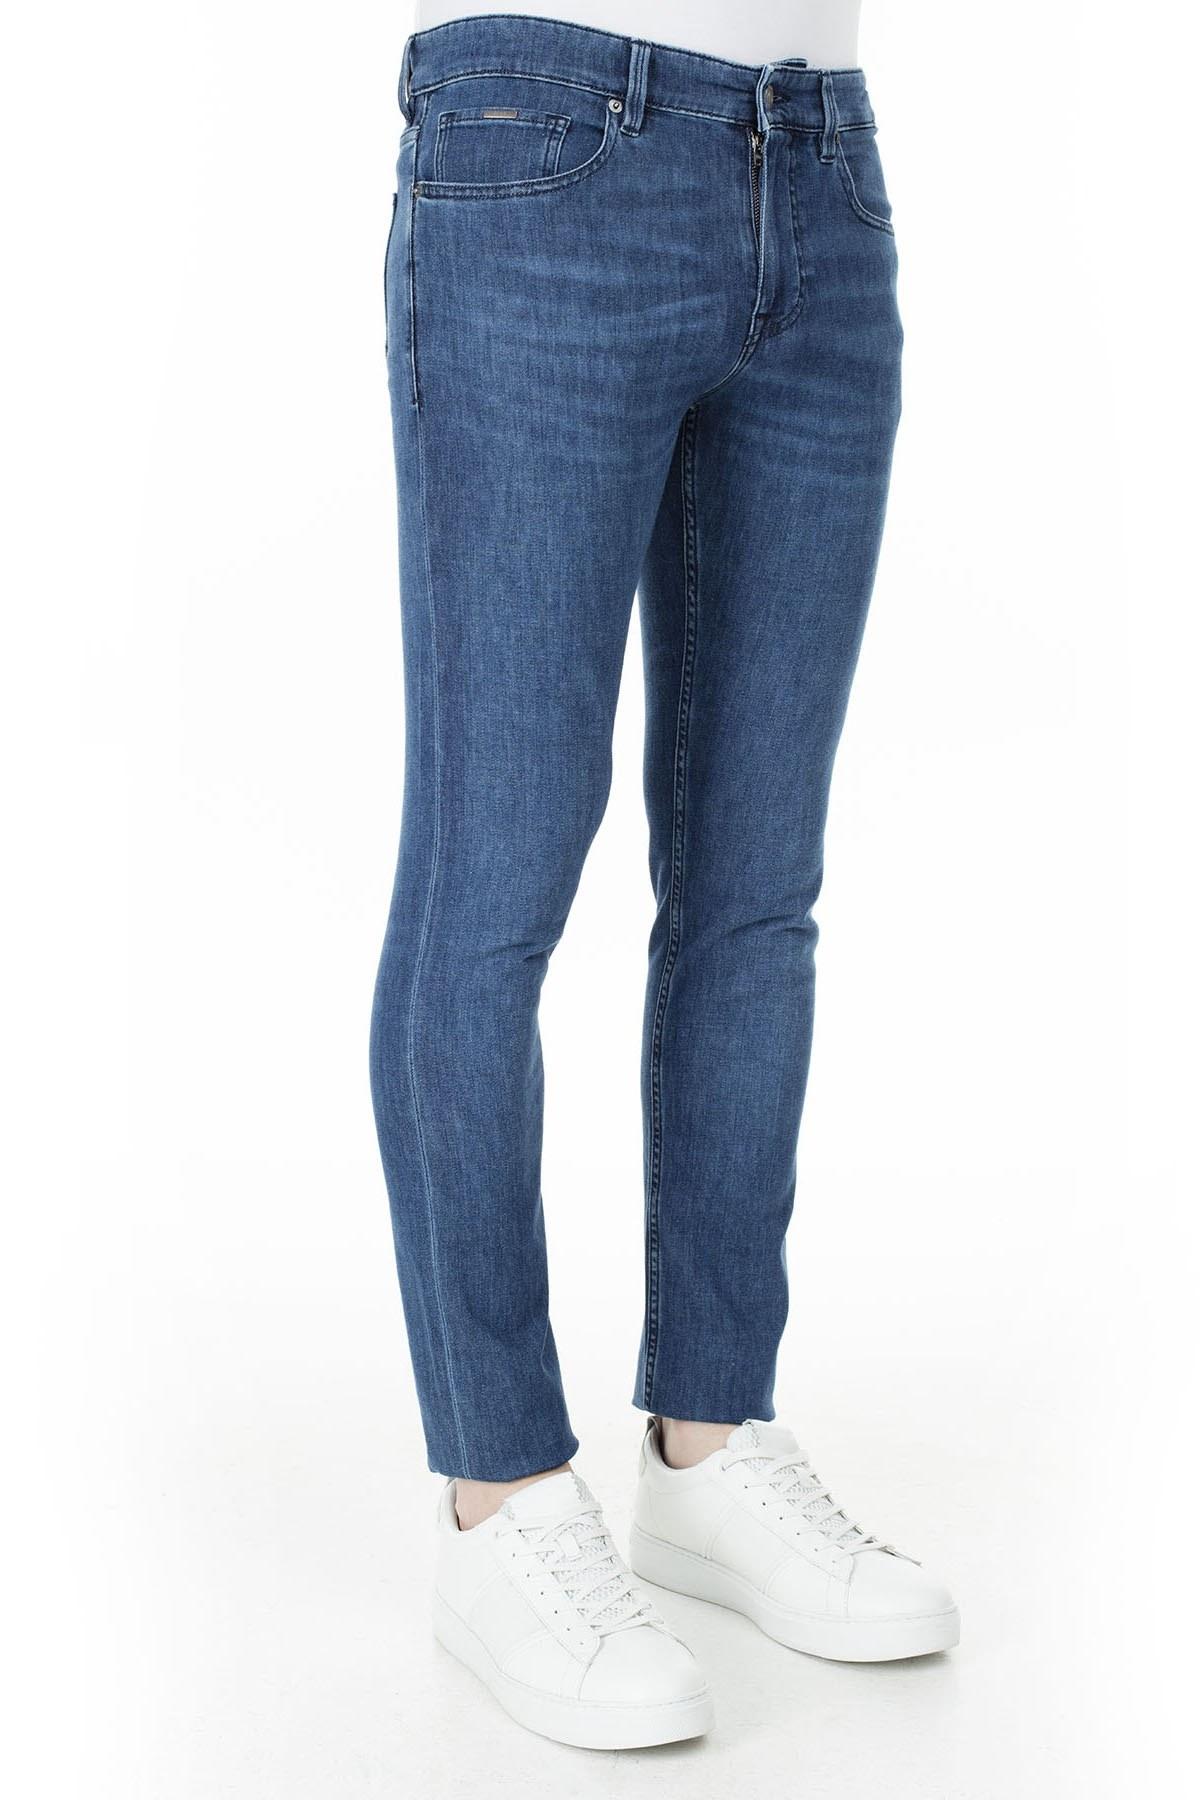 Hugo Boss Slim Fit Jeans Erkek Kot Pantolon 50426476 425 LACİVERT